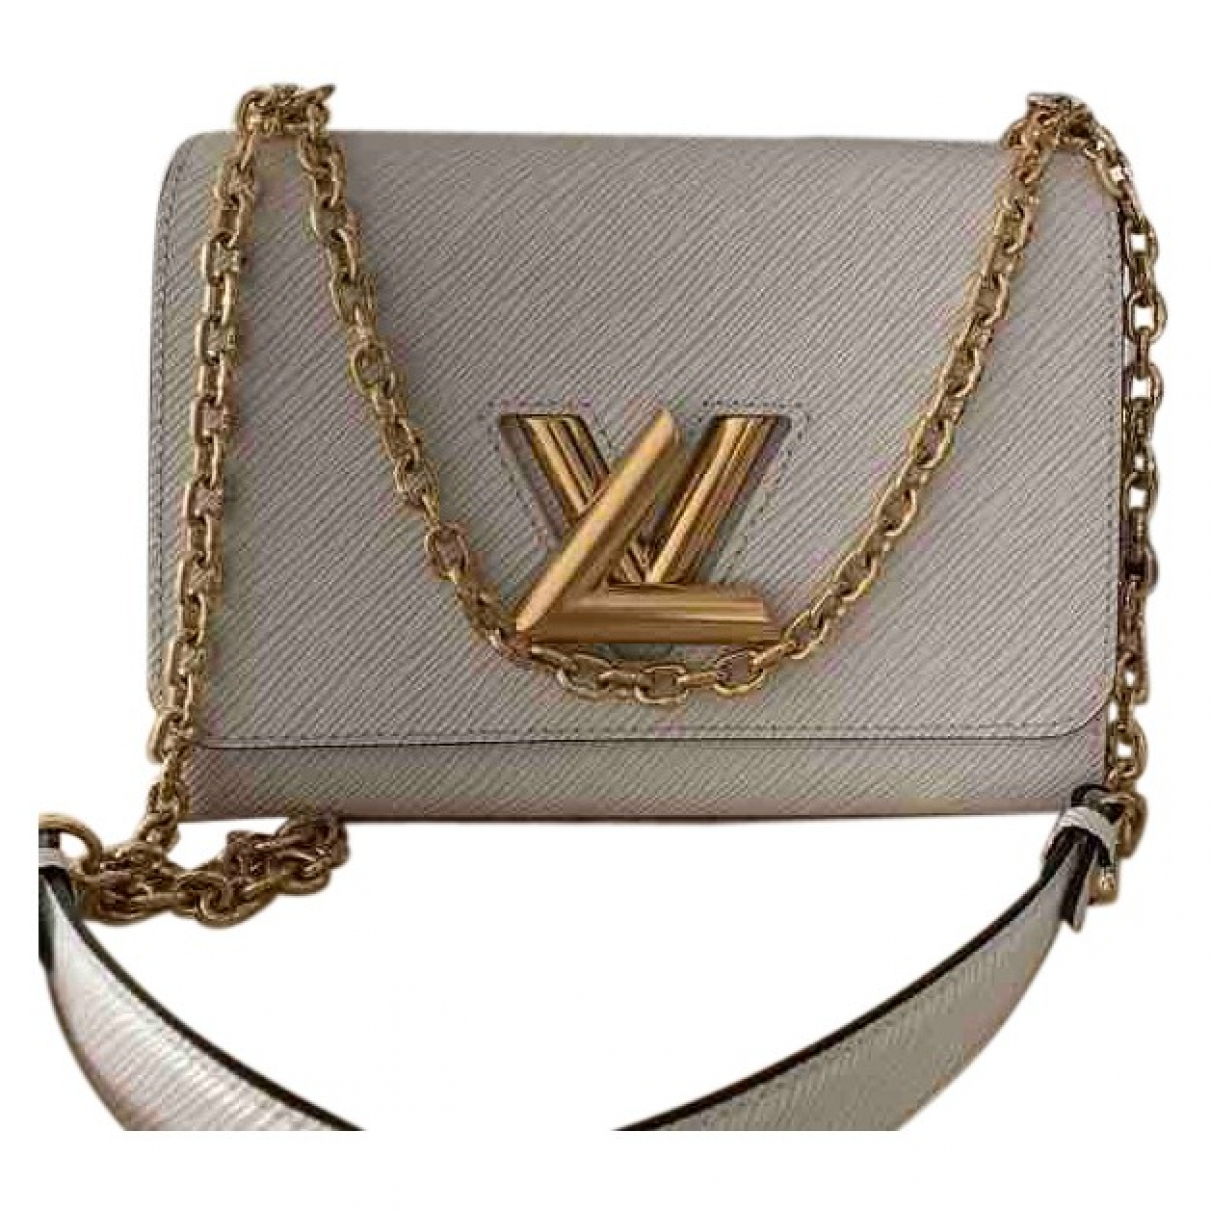 Louis Vuitton - Sac a main Twist pour femme en cuir - ecru